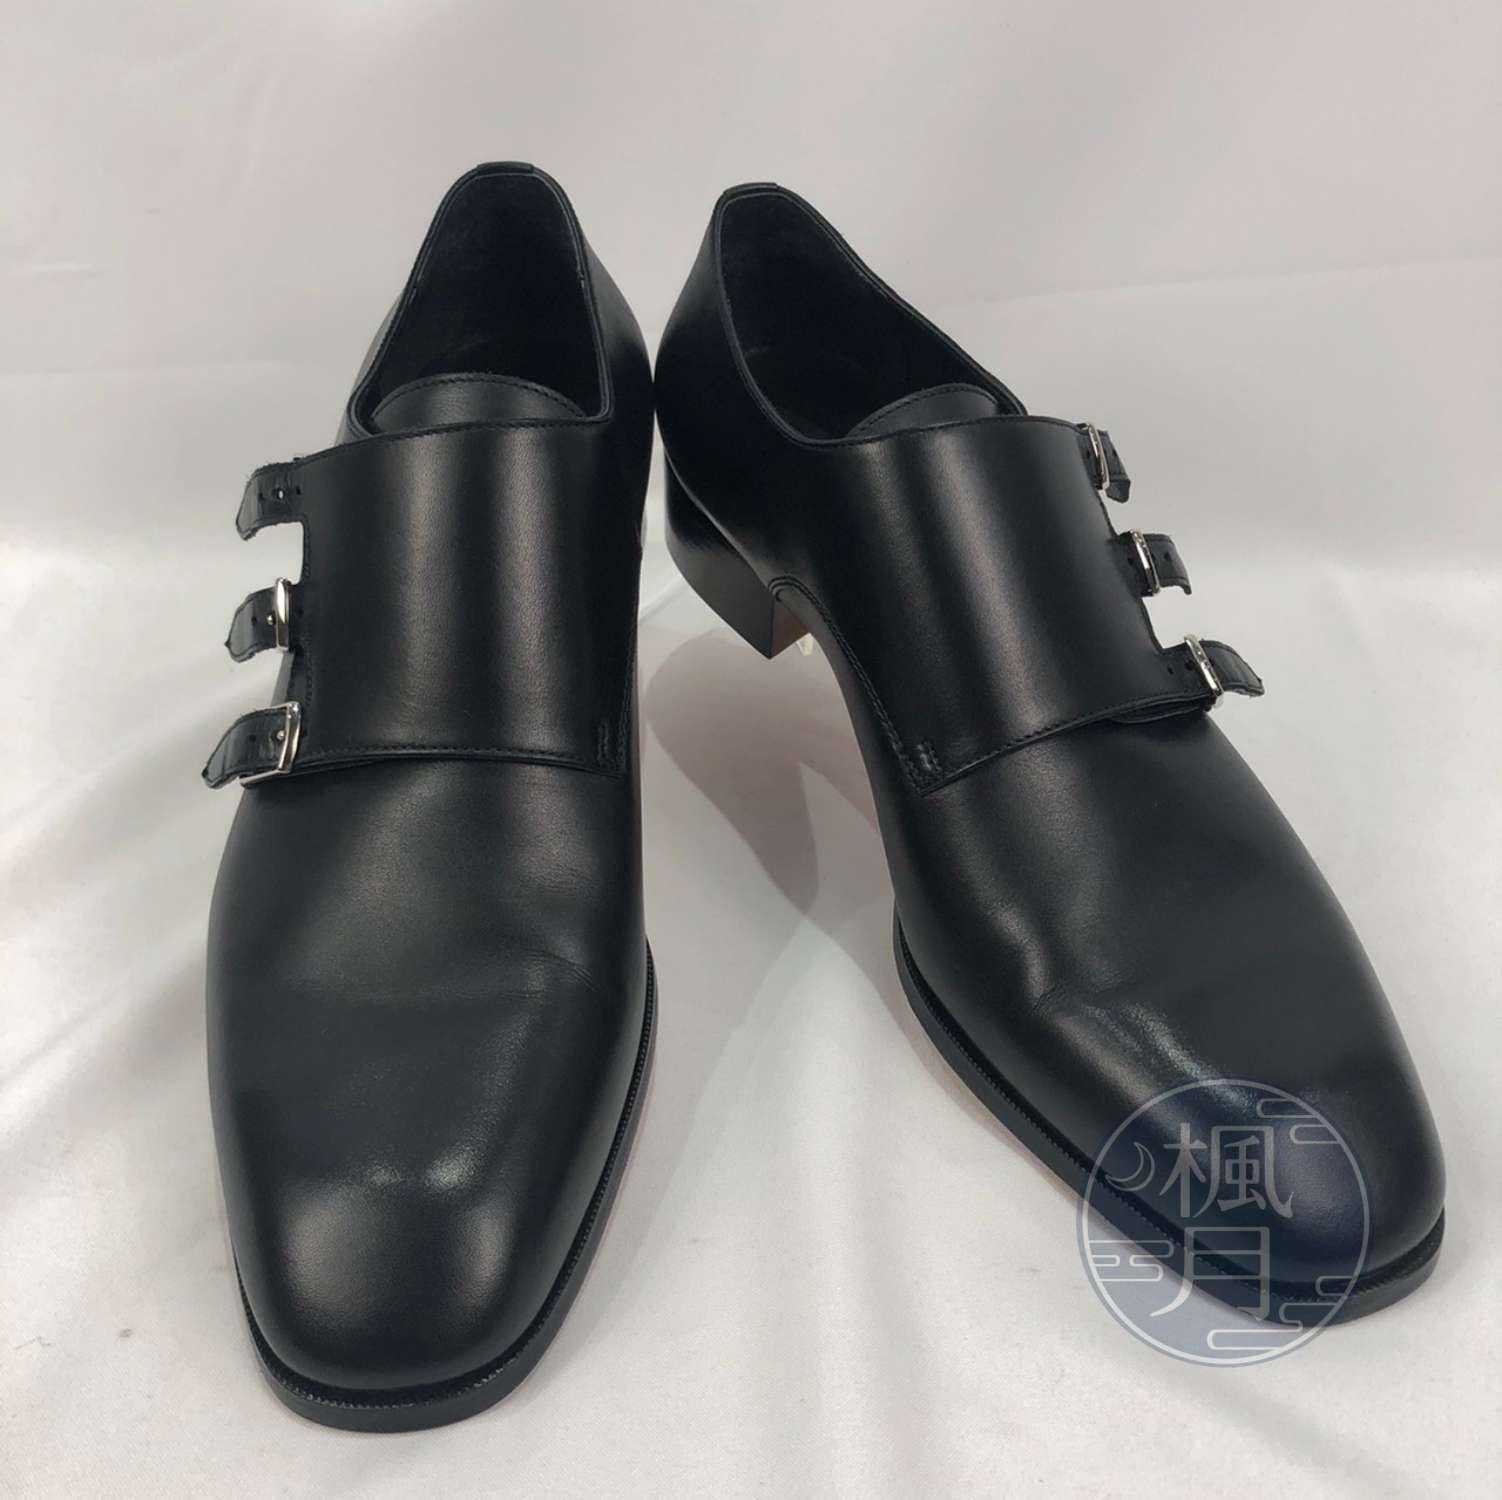 BRAND楓月 HERMES 愛馬仕 高氣質 黑皮鞋 橘底 尖頭 紳士鞋 牛津鞋 鞋子 #44.5